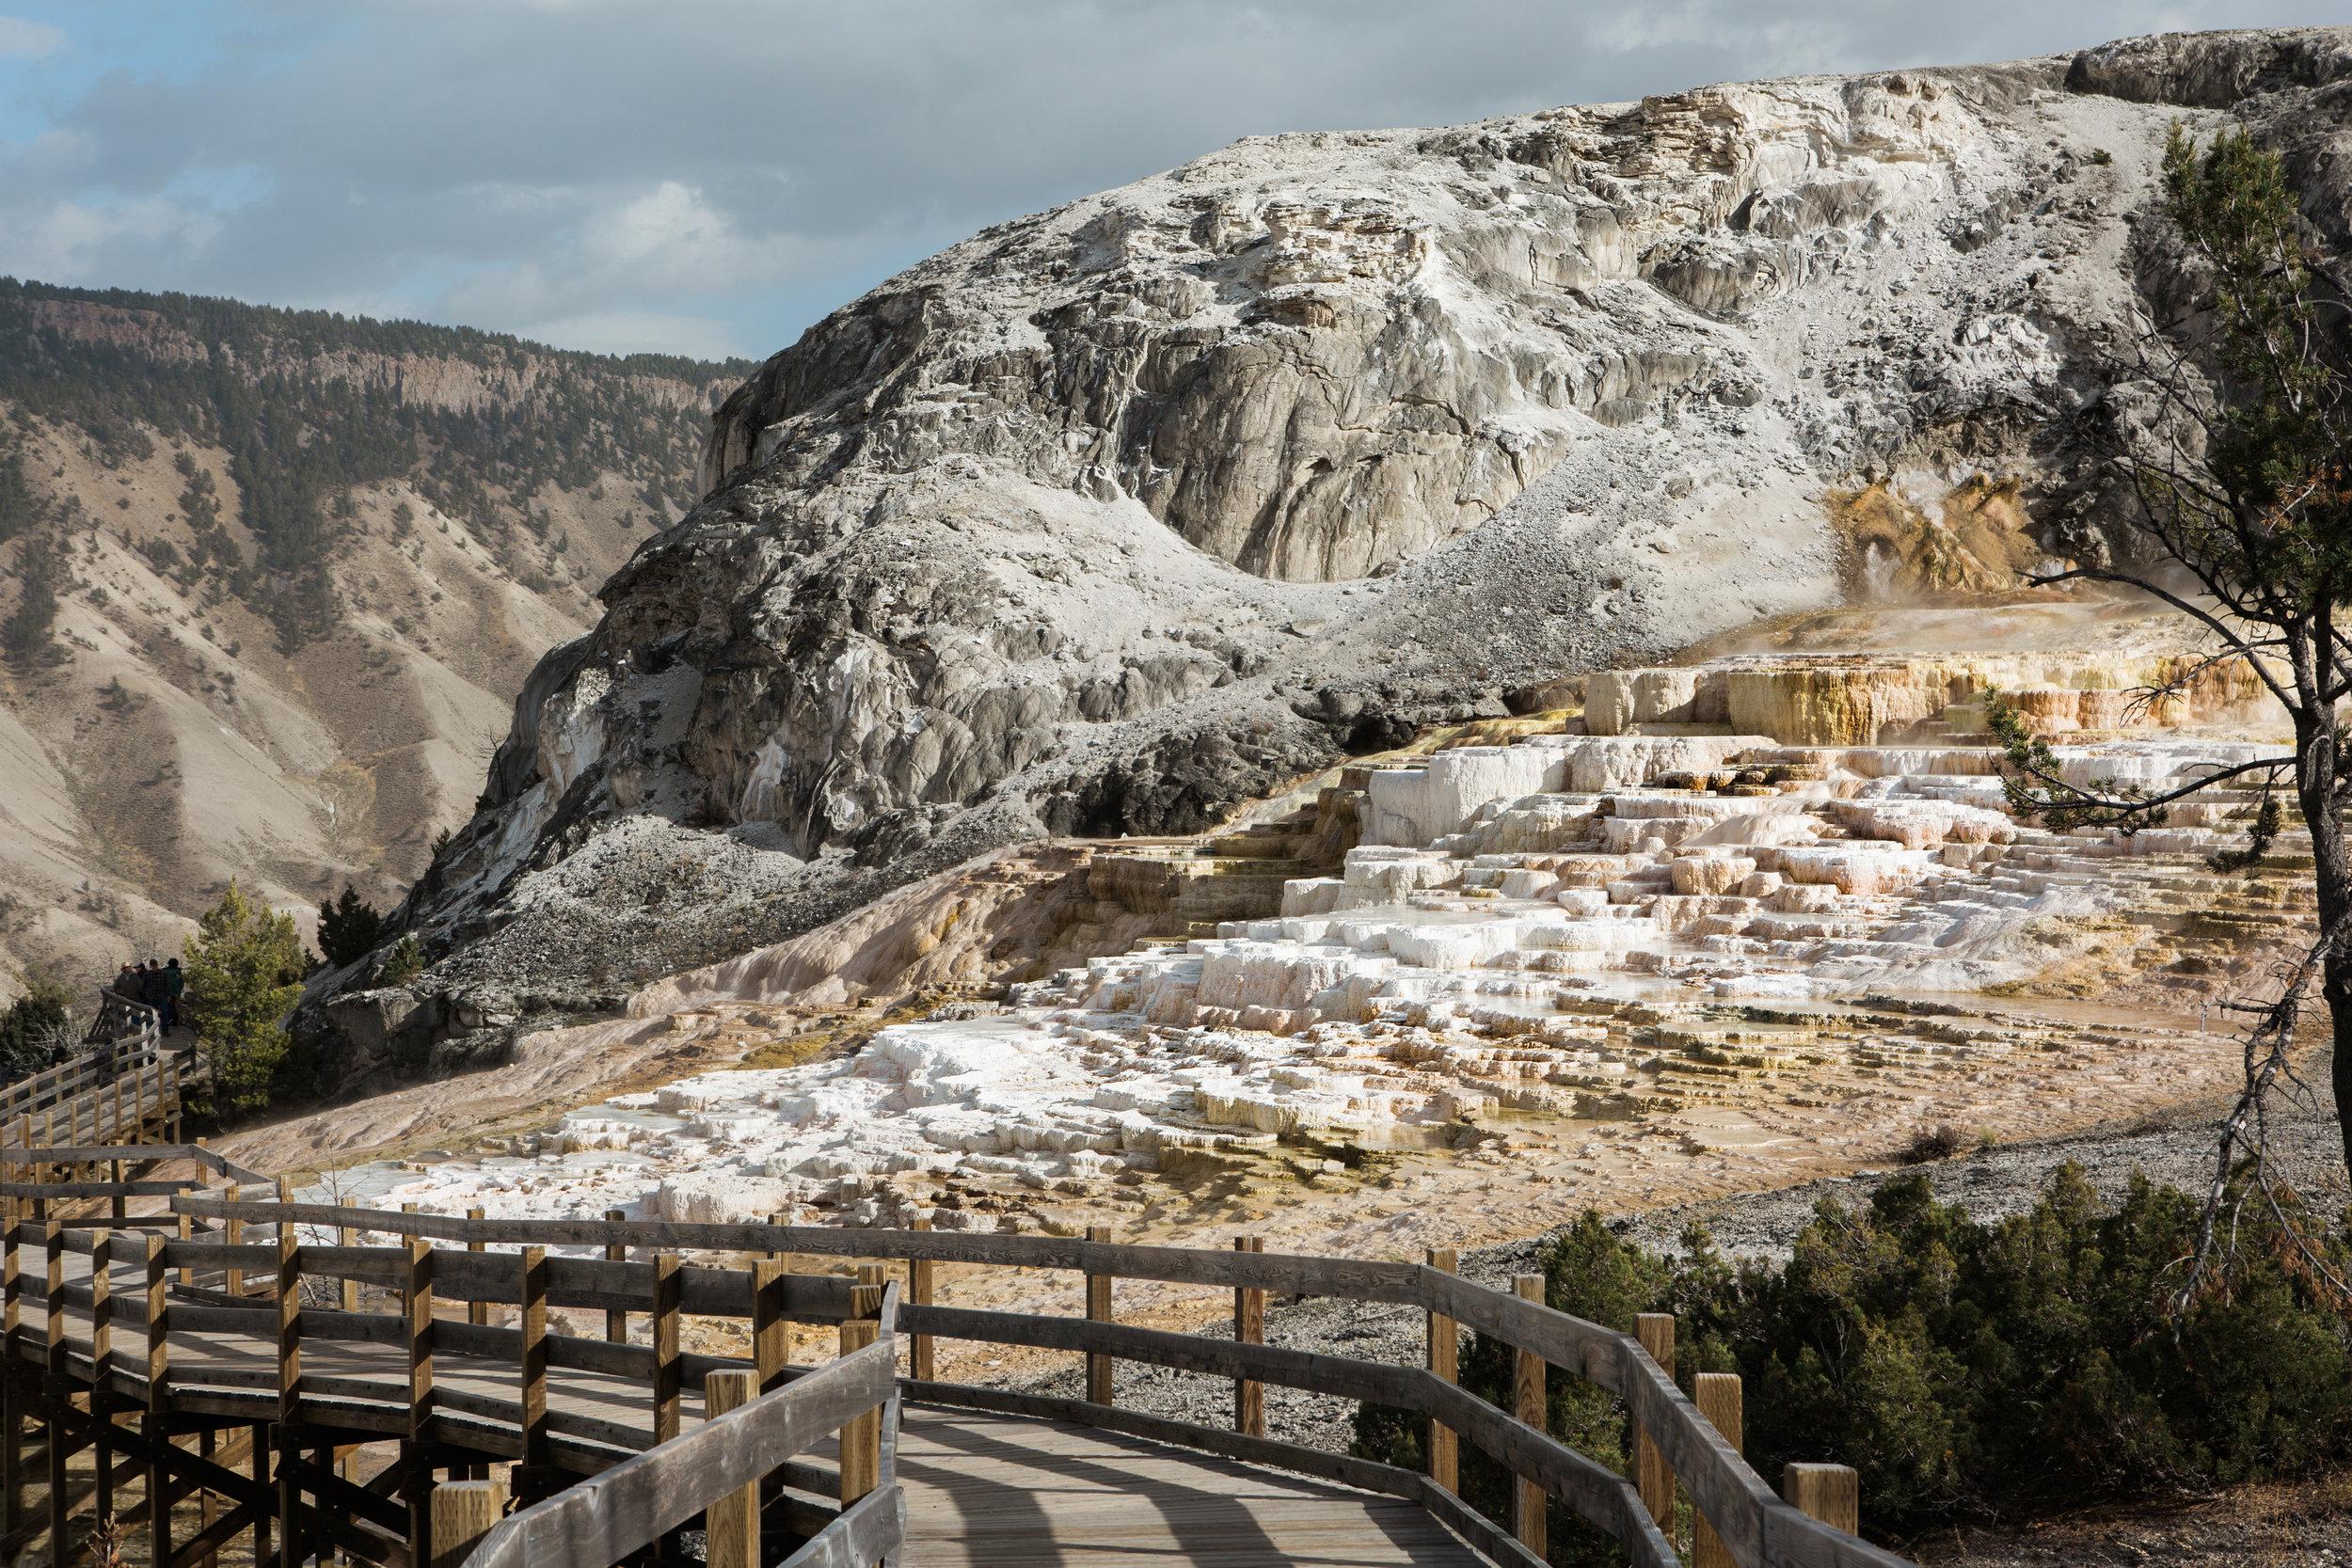 CindyGiovagnoli_Yellowstone_National_Park_Montana_Wyoming_bison_pronghorn_snow_elk_truckcamping-009.jpg